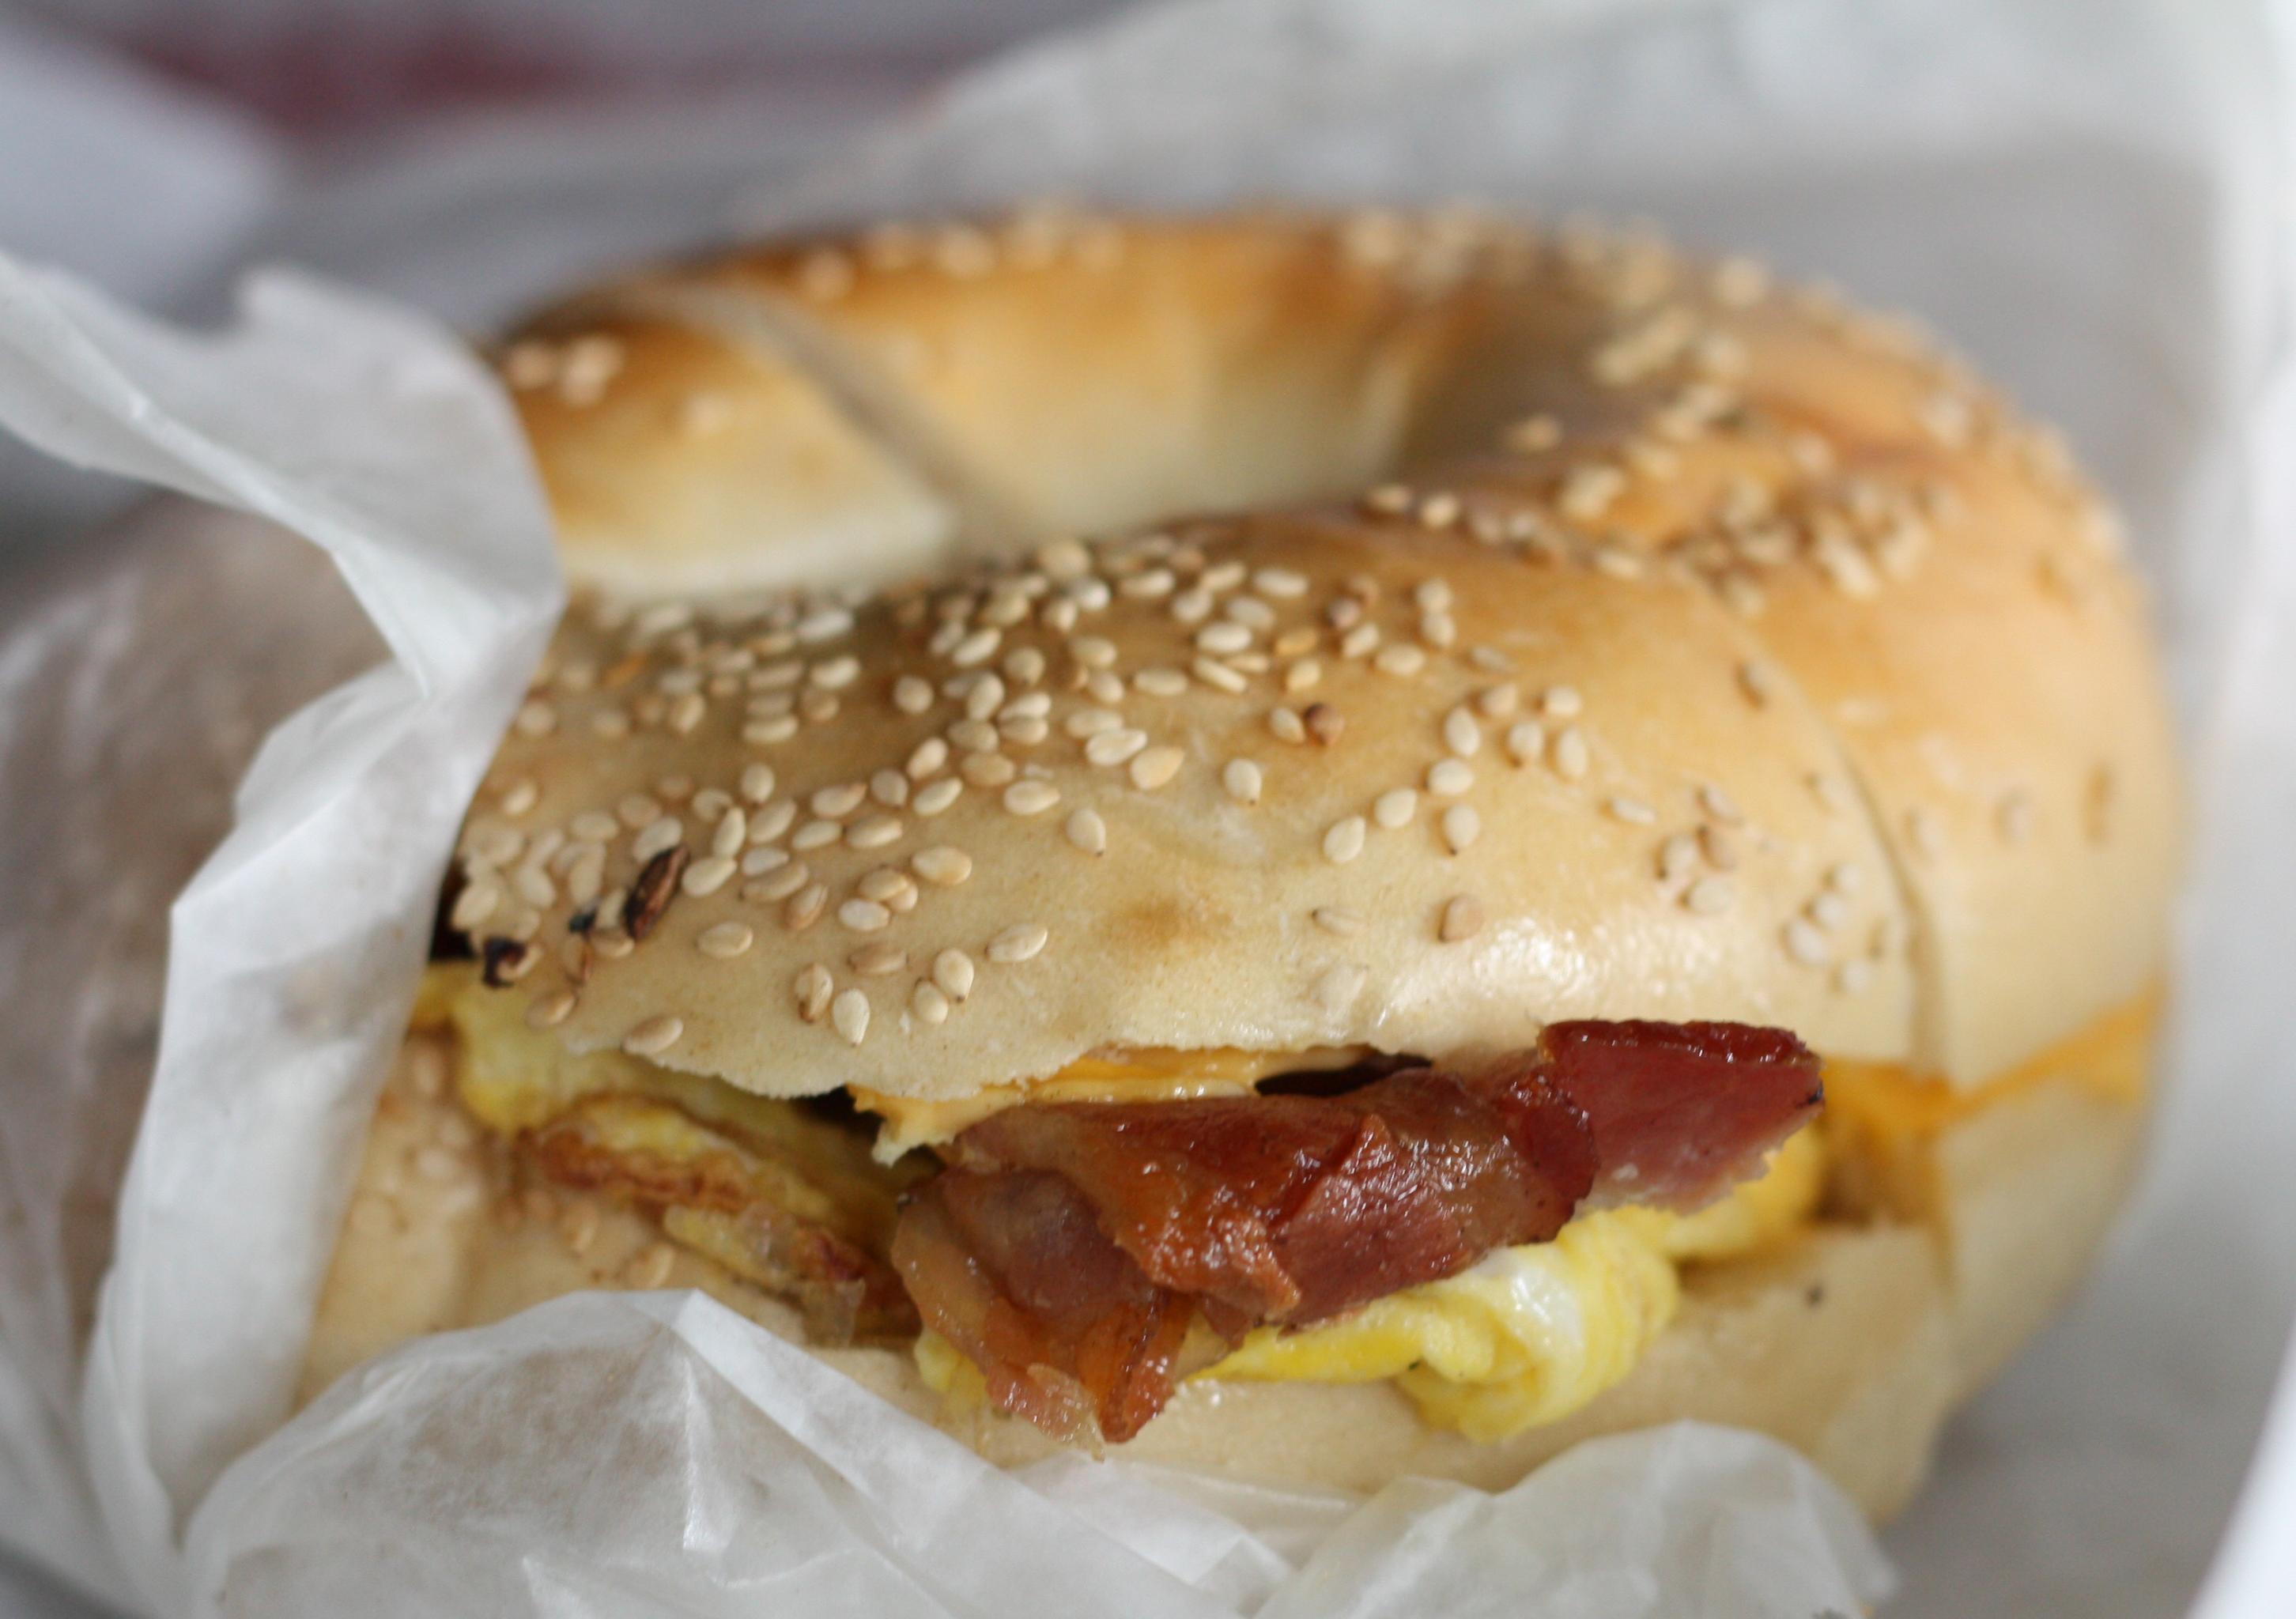 New York Bagel Egg Sandwich Image